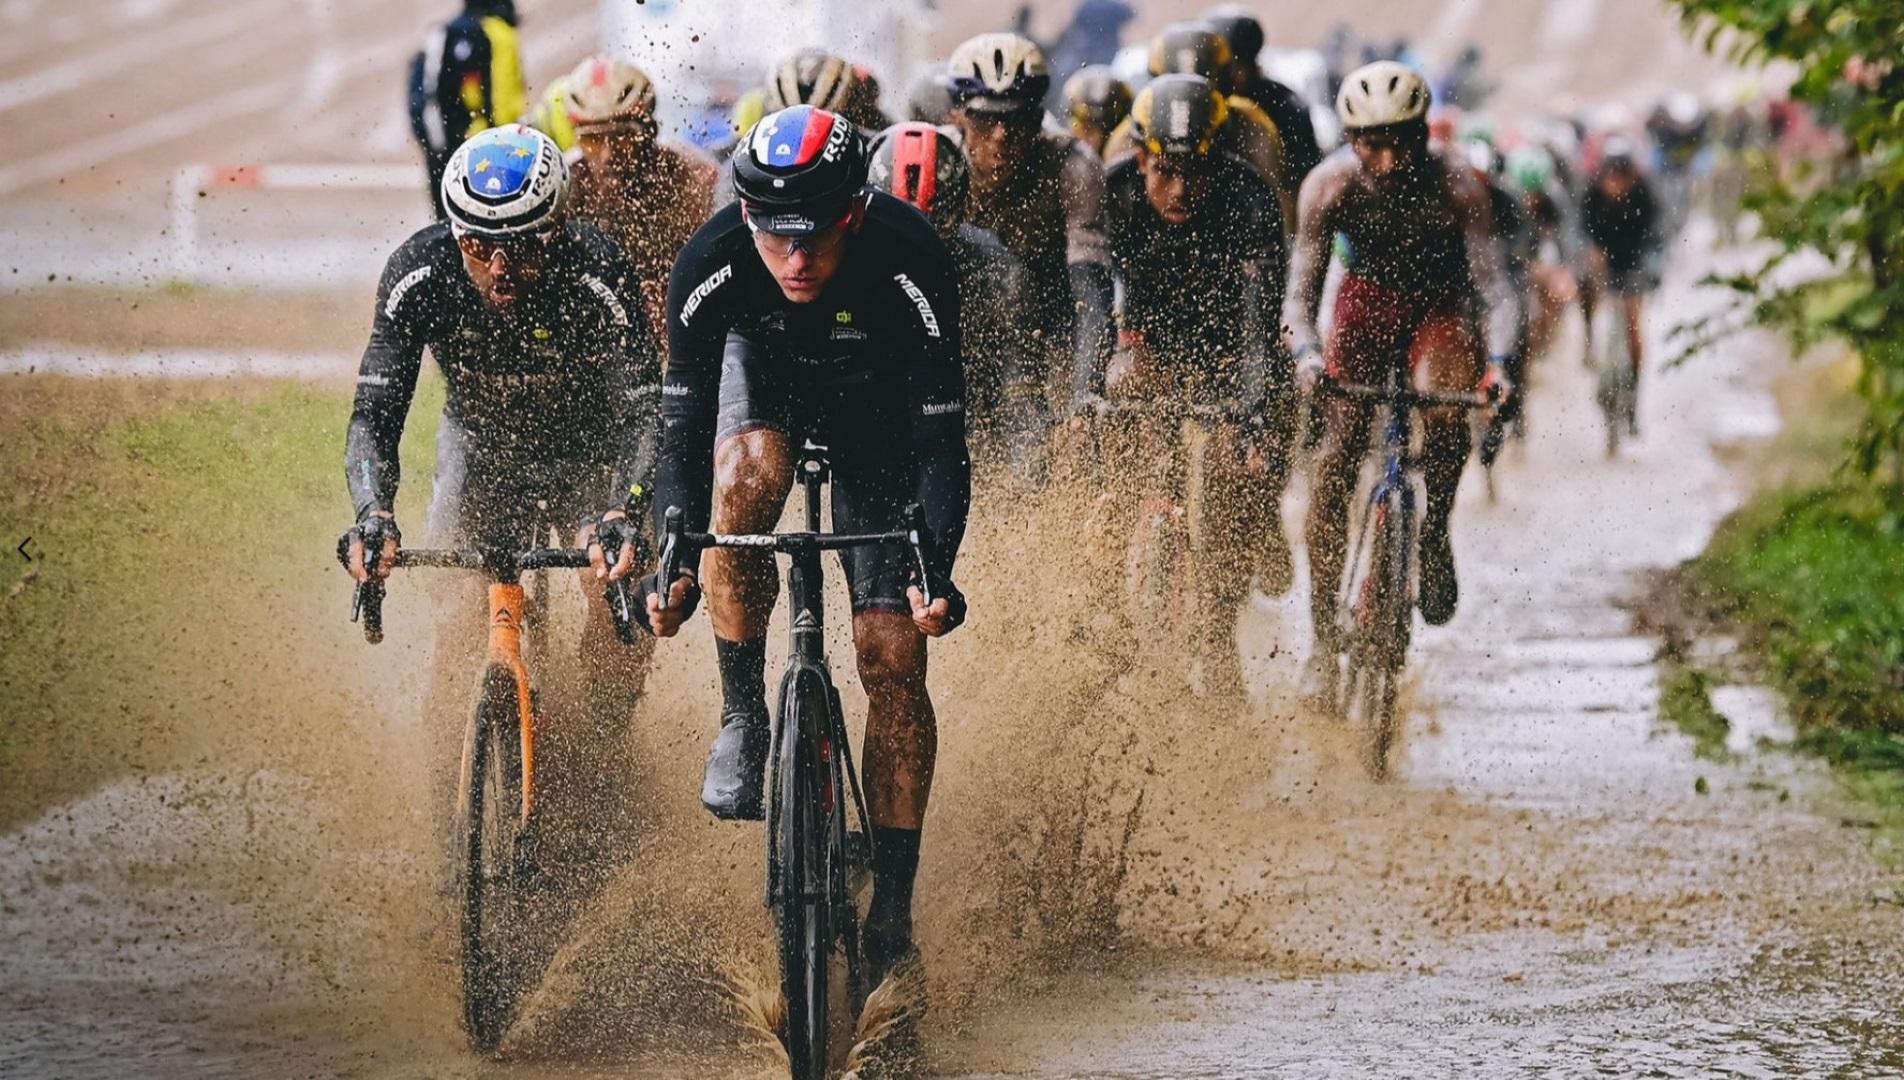 Paris-Roubaix_Sonny Colbrelli